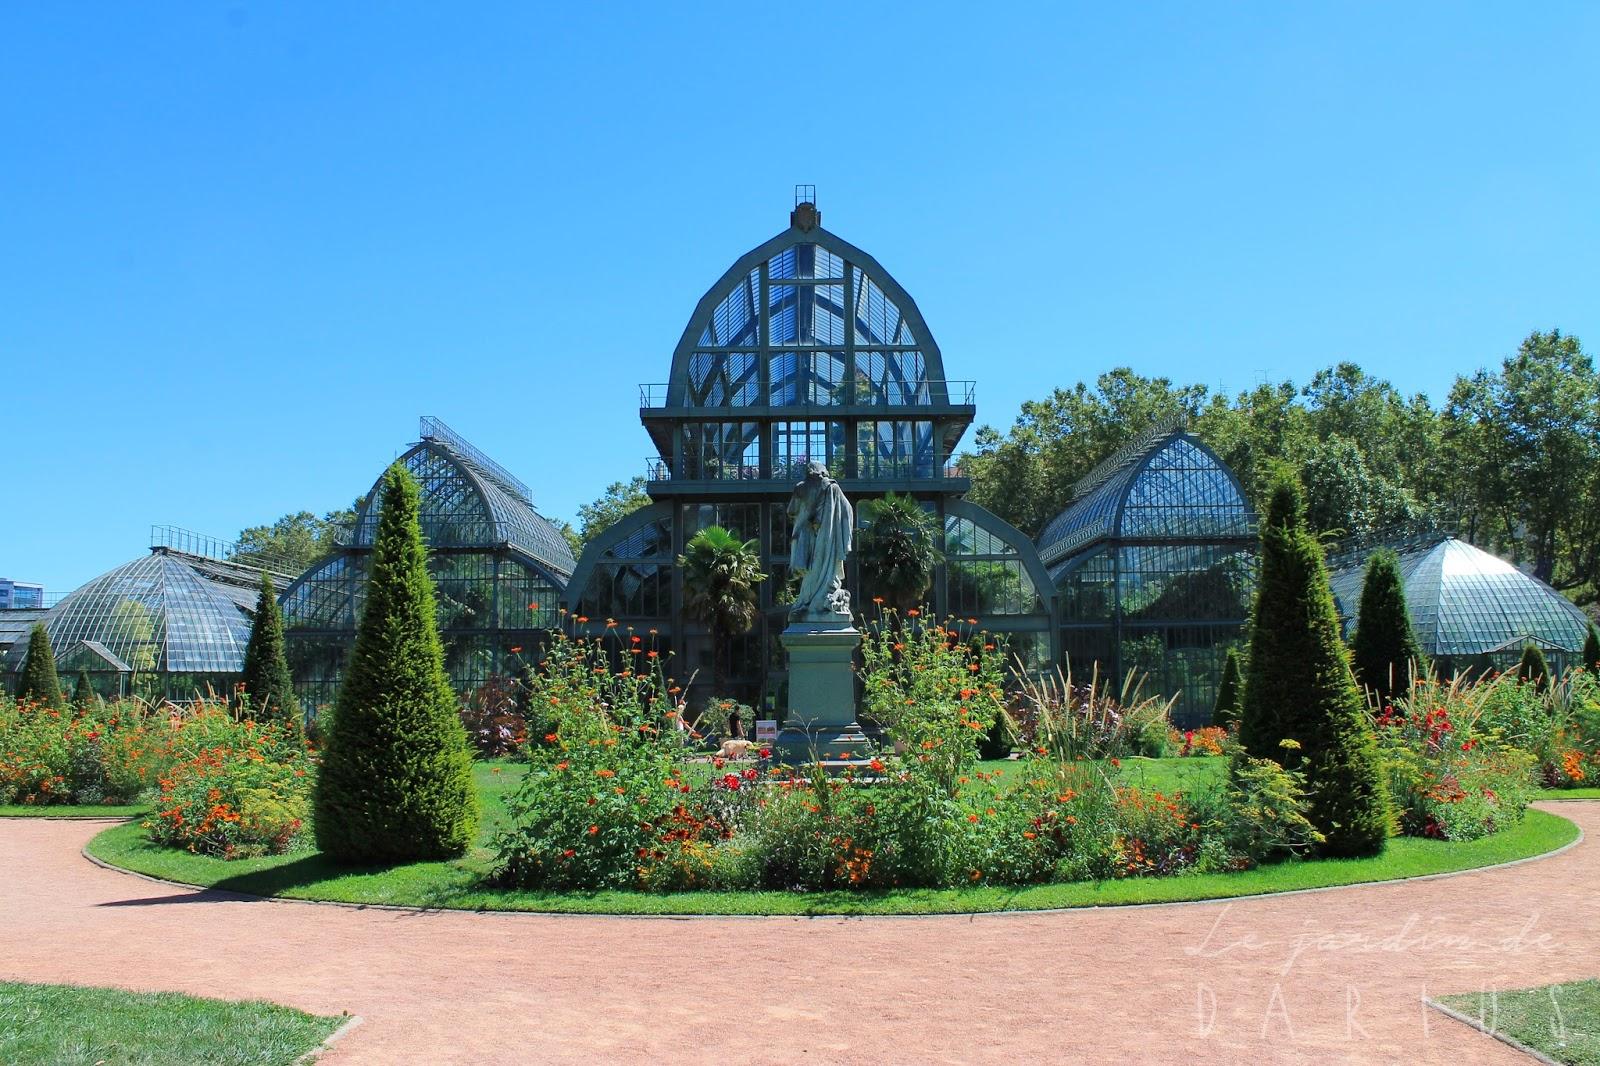 Le jardin de darius r trospective ao t 2016 for Jardin zoologique de lyon